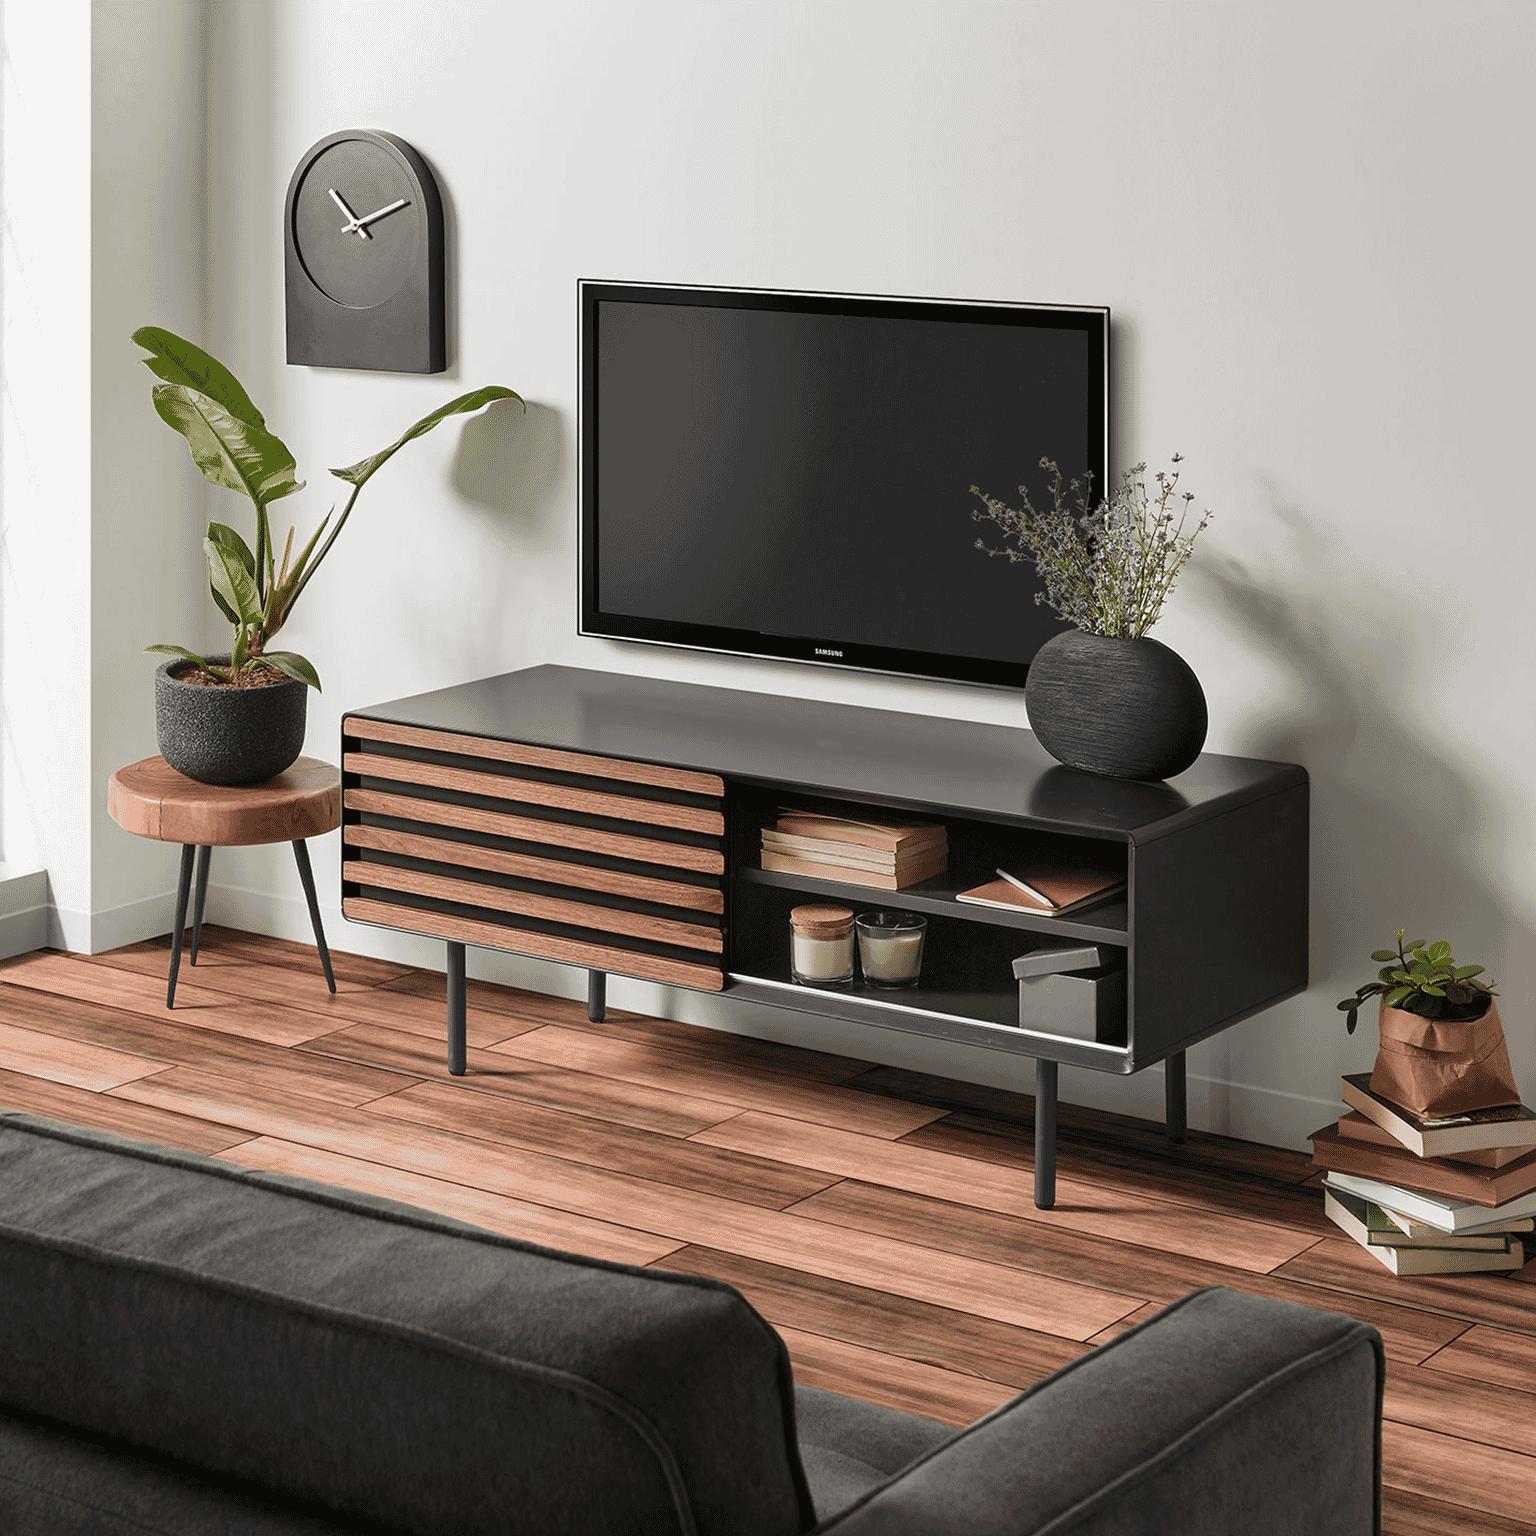 Nette Tv Kast.Kave Home Tv Meubel Kesia 120cm Mh004l02 Meubelpartner